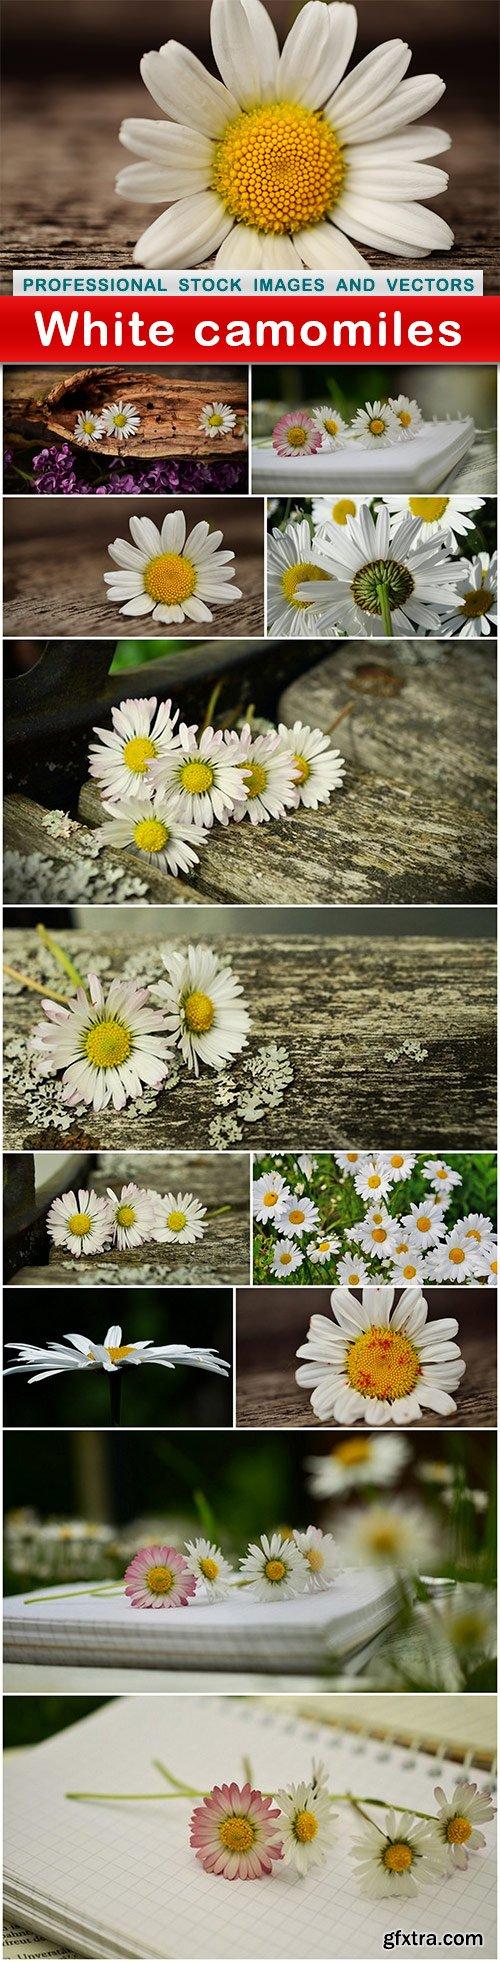 White camomiles - 13 UHQ JPEG